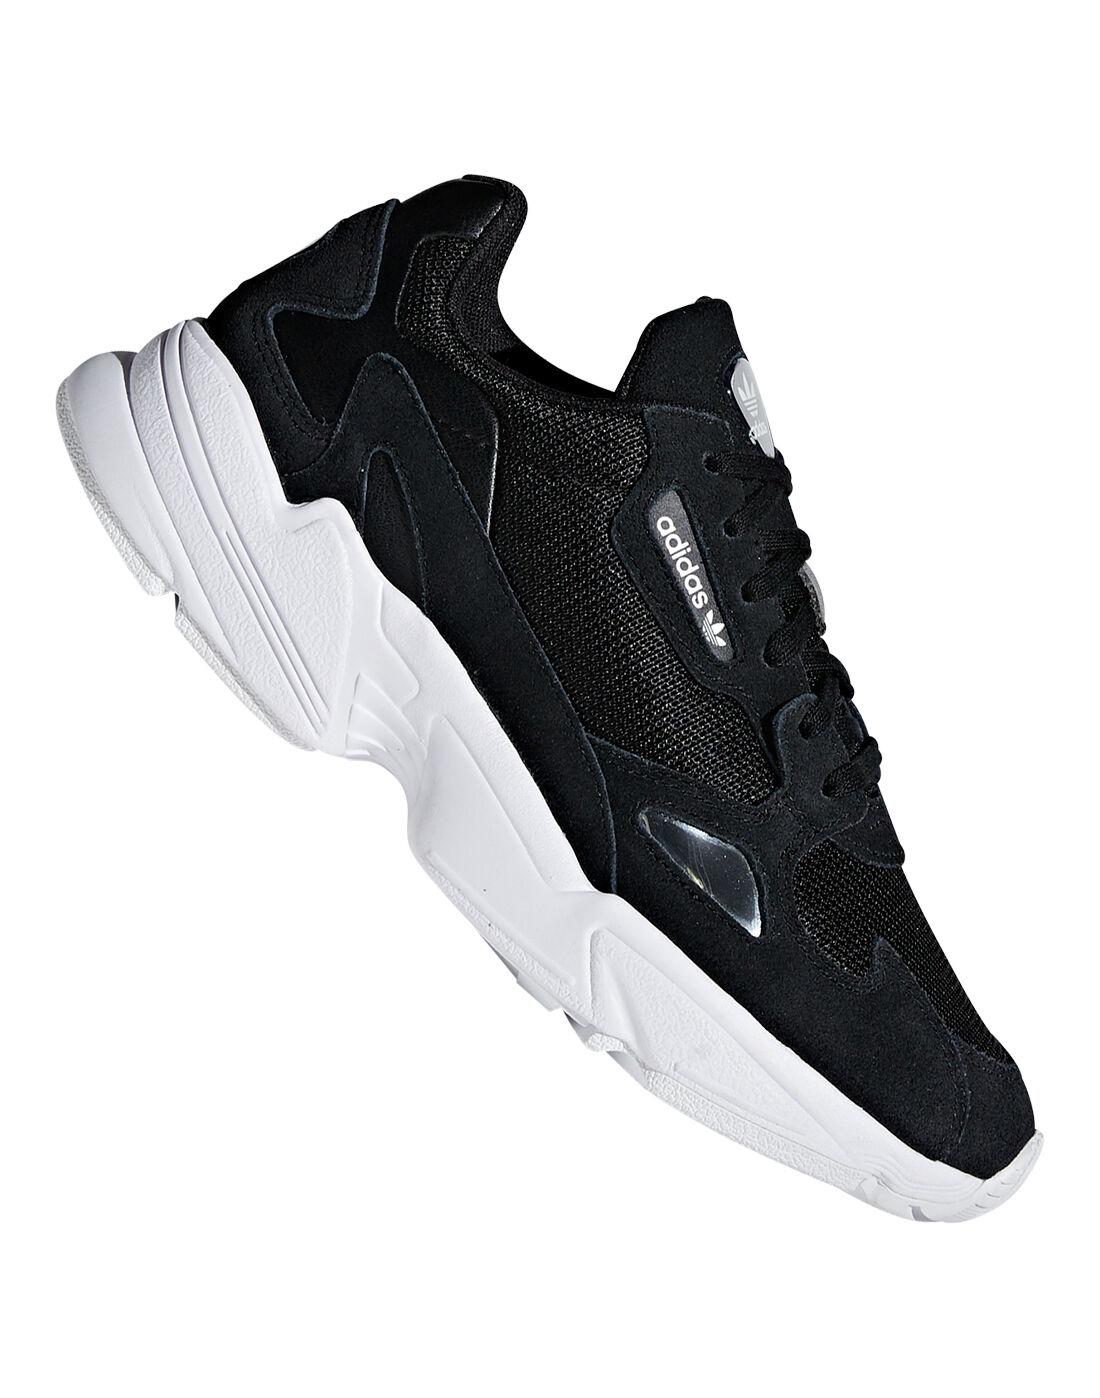 Black adidas Originals Falcon Trainers